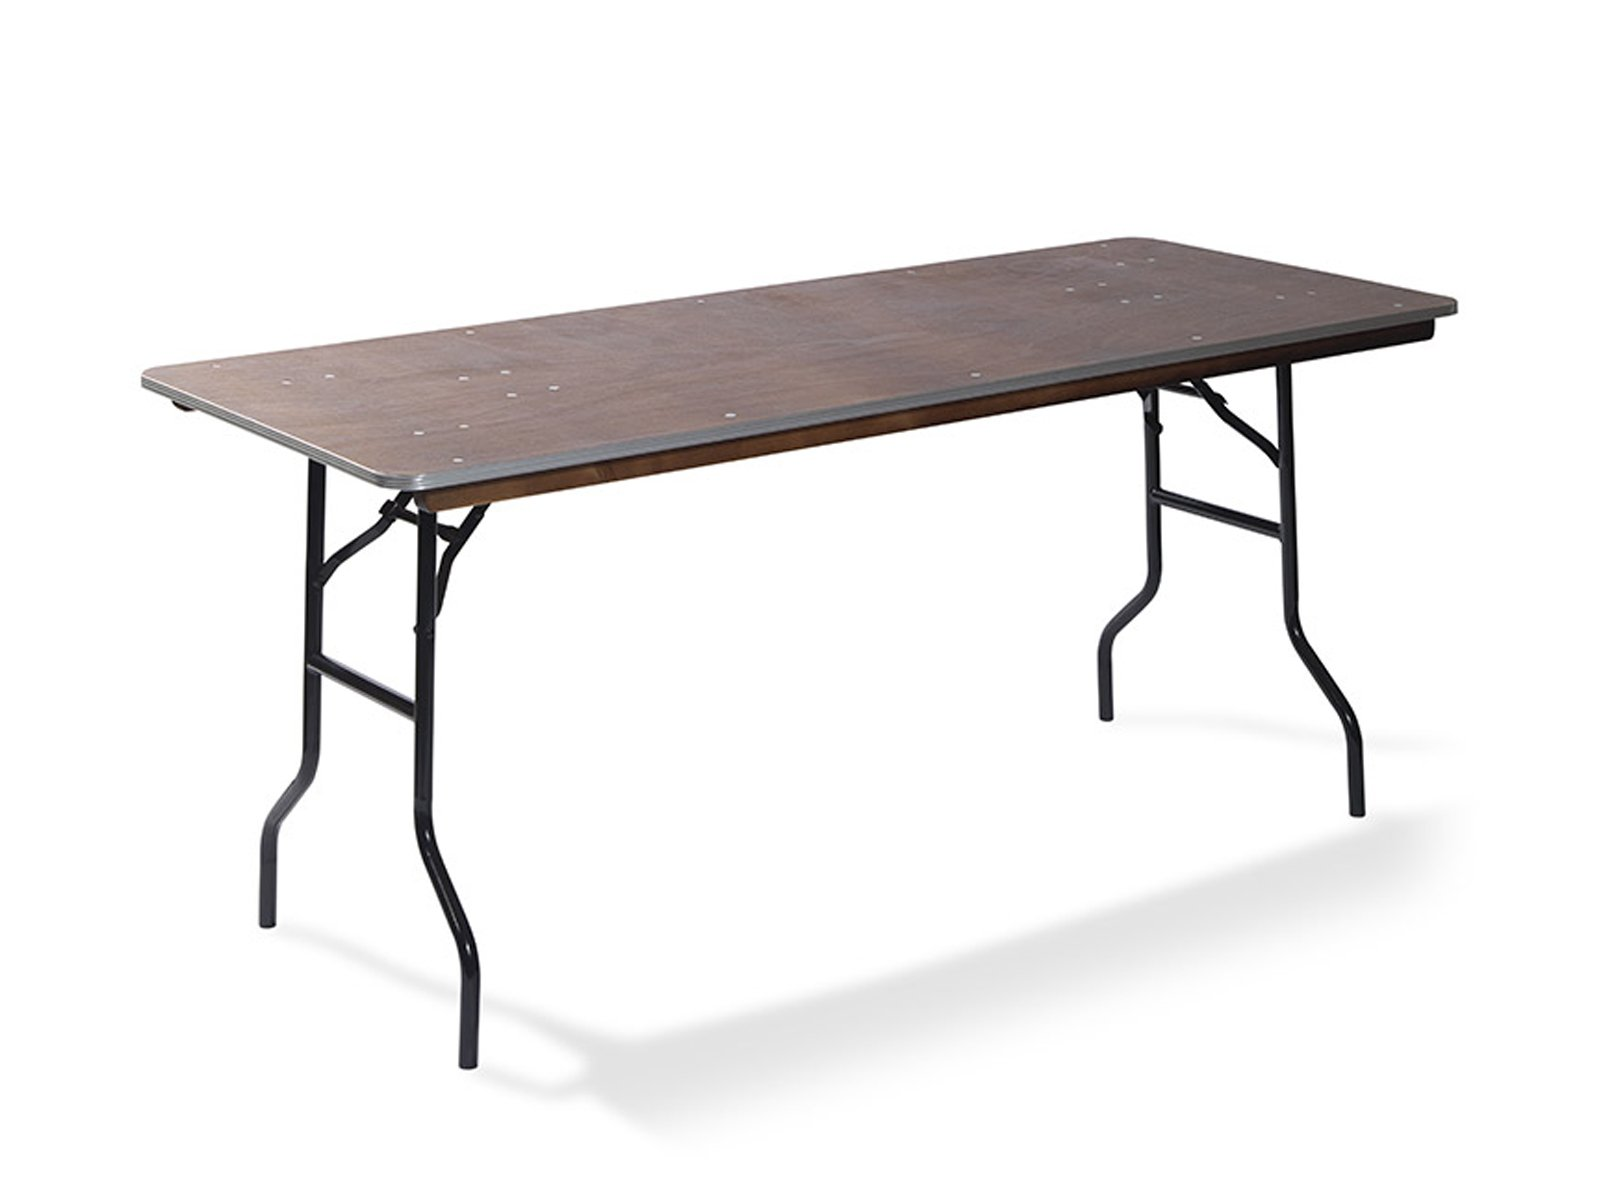 Tafels en stoelen Partytentkopen.nl